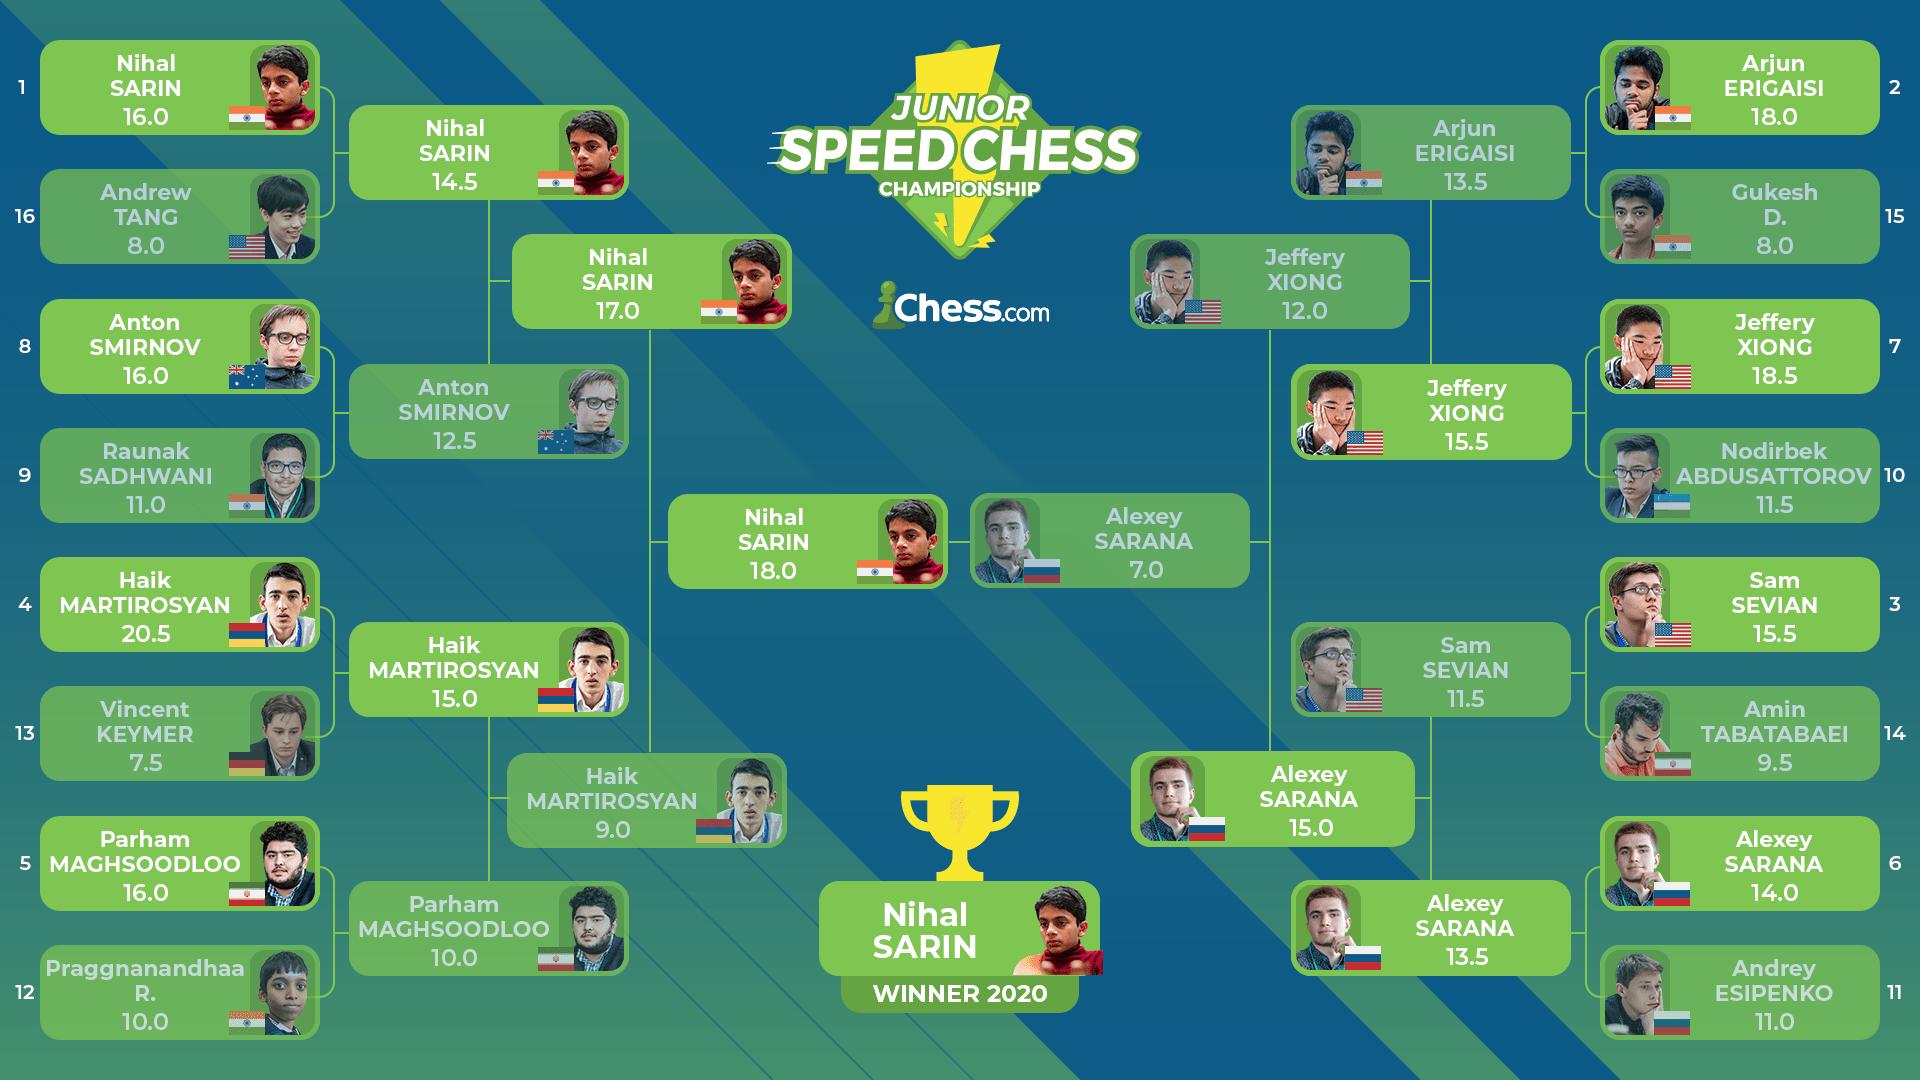 Junior Speed Chess Championship final bracket